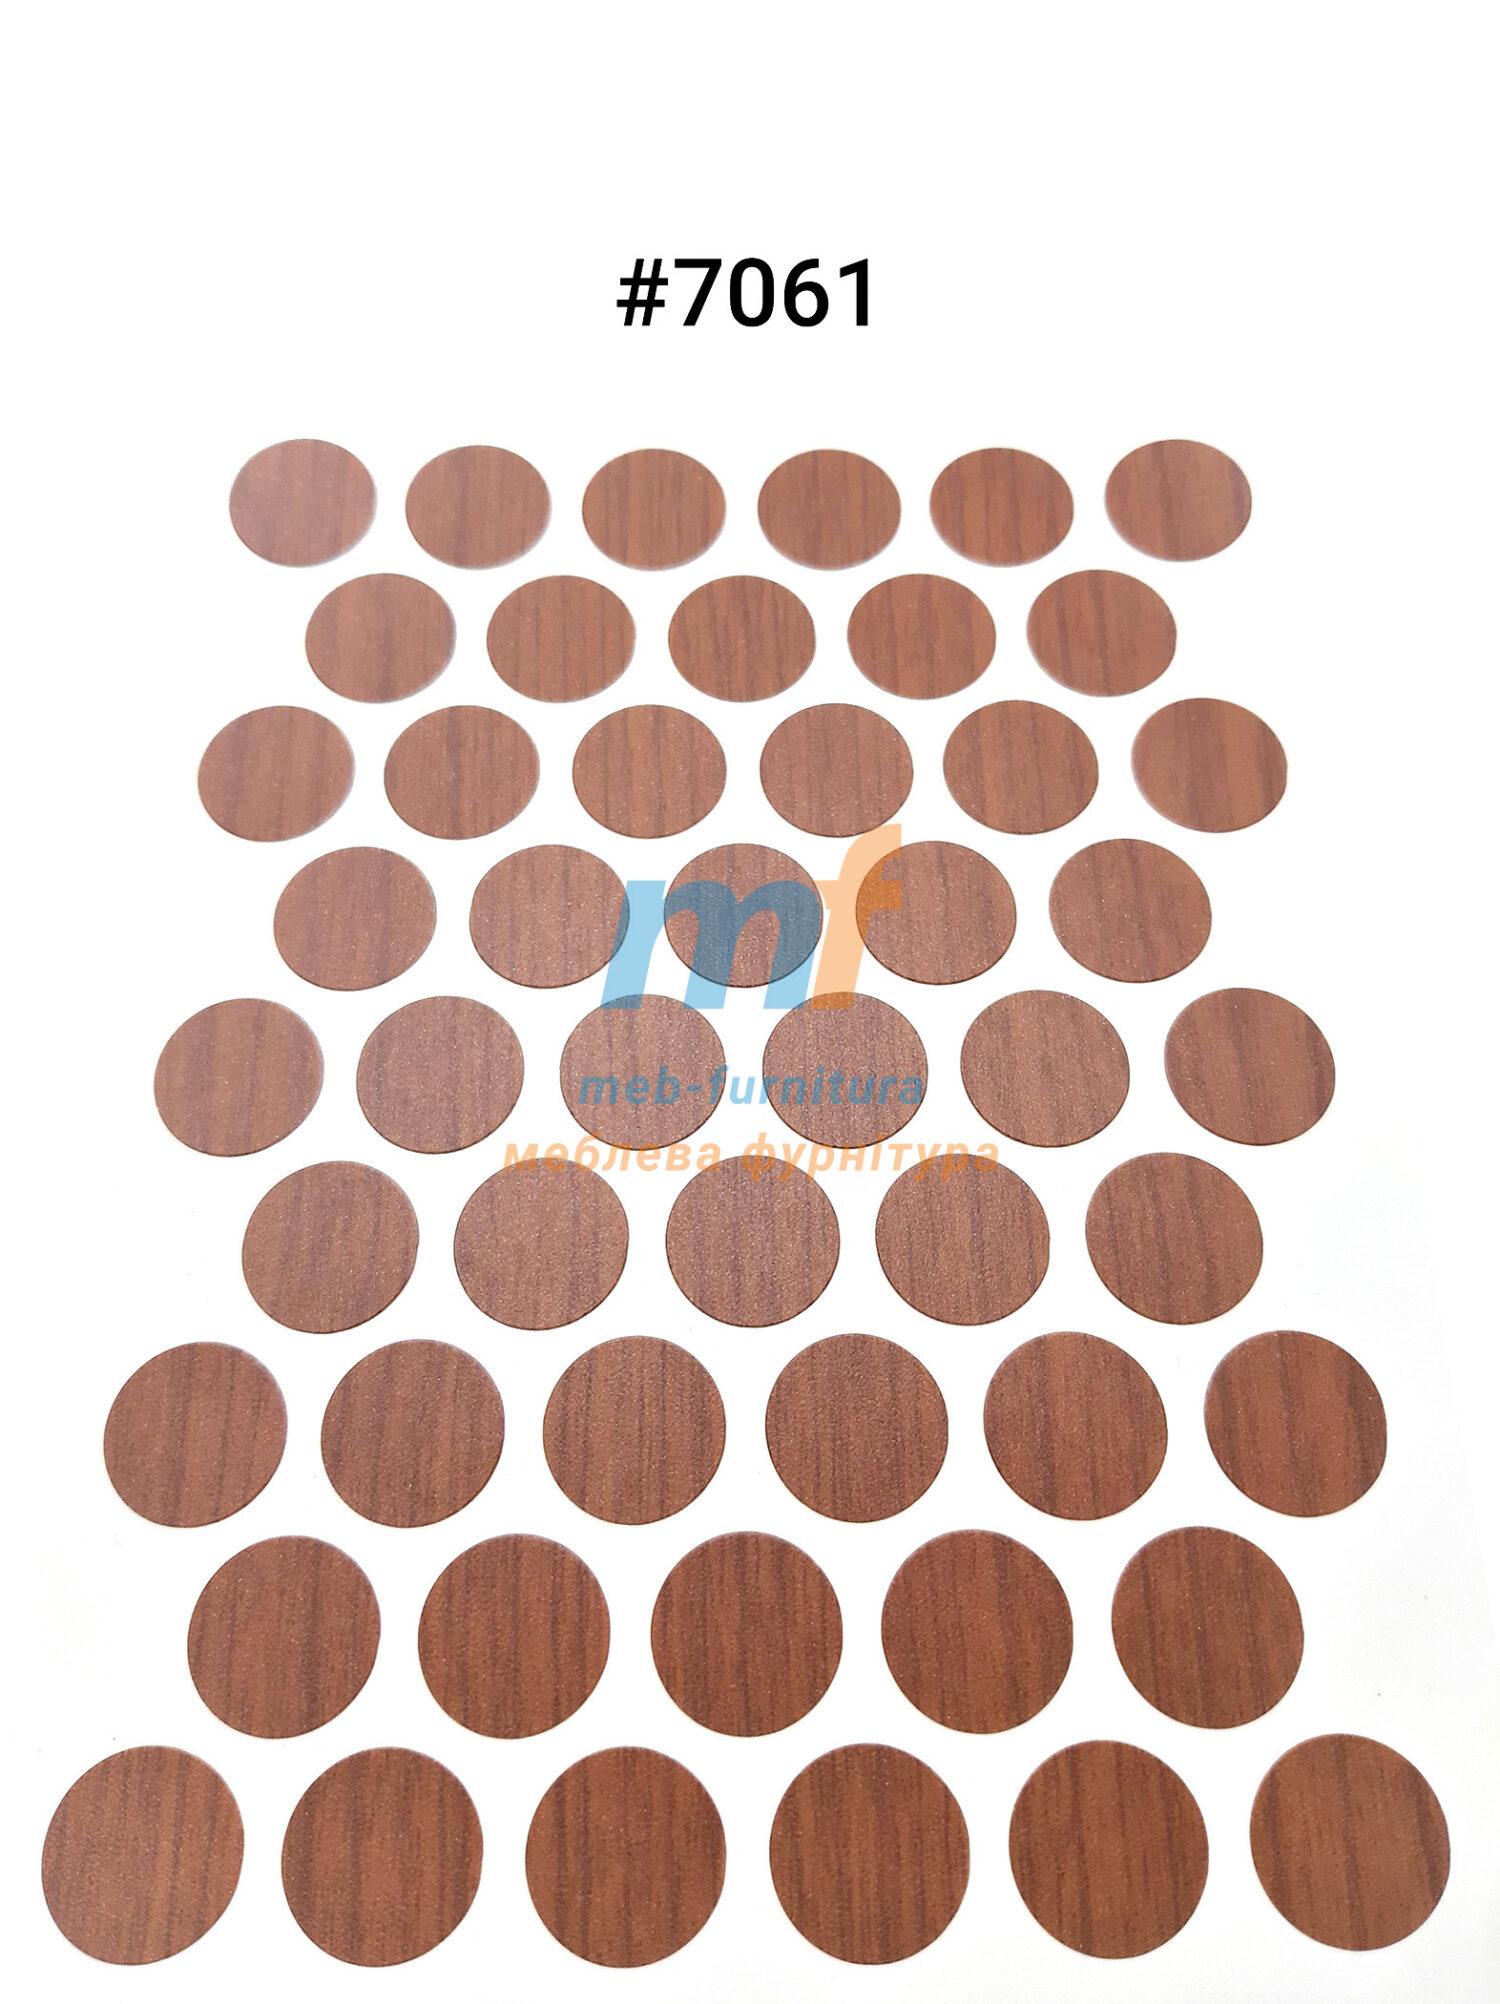 Заглушка на самоклейке для конфирмата,шурупа (7061)